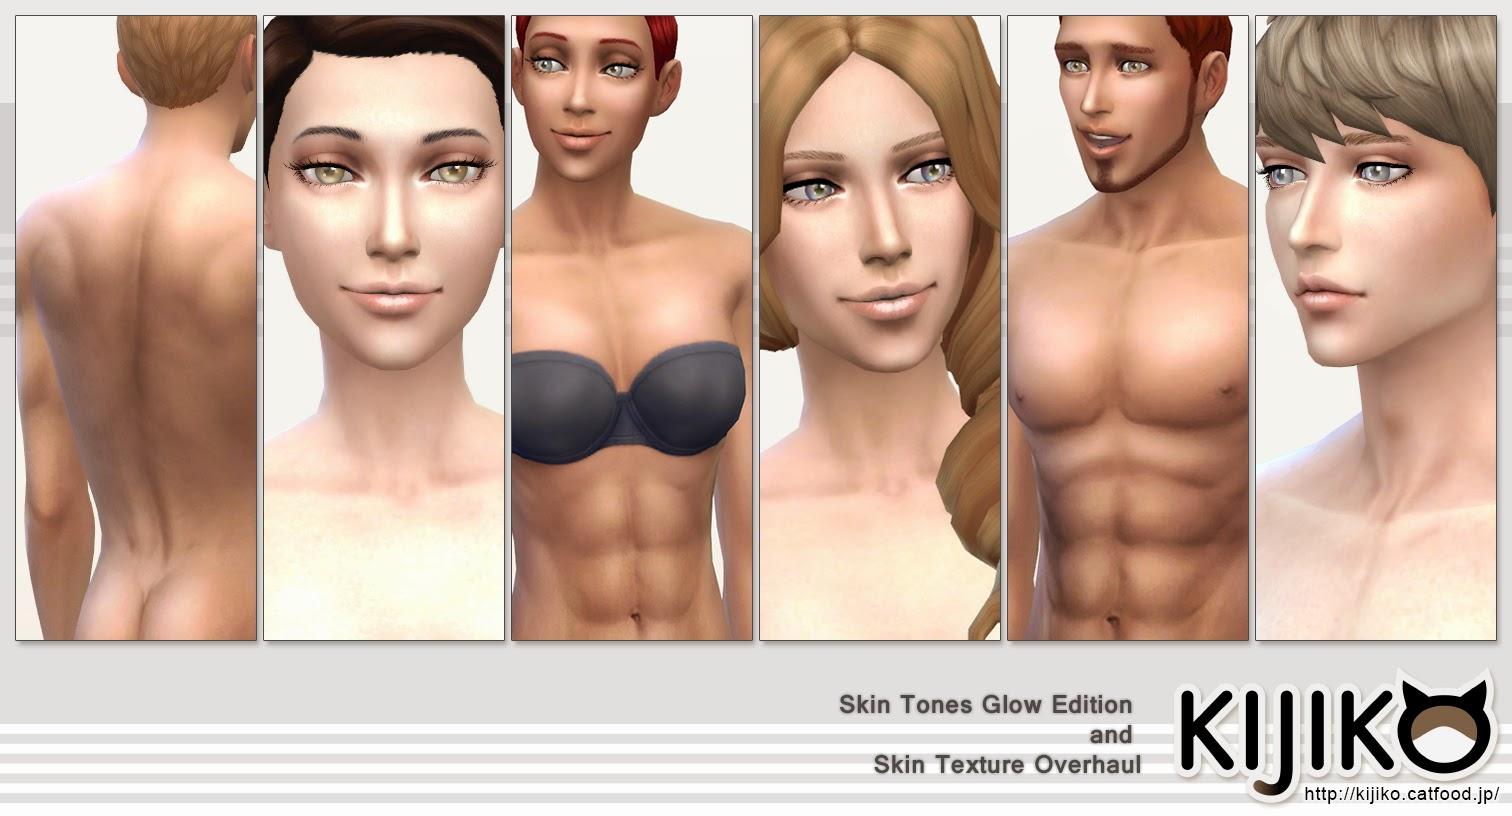 Warcraft 3 skin tones realistic porn download